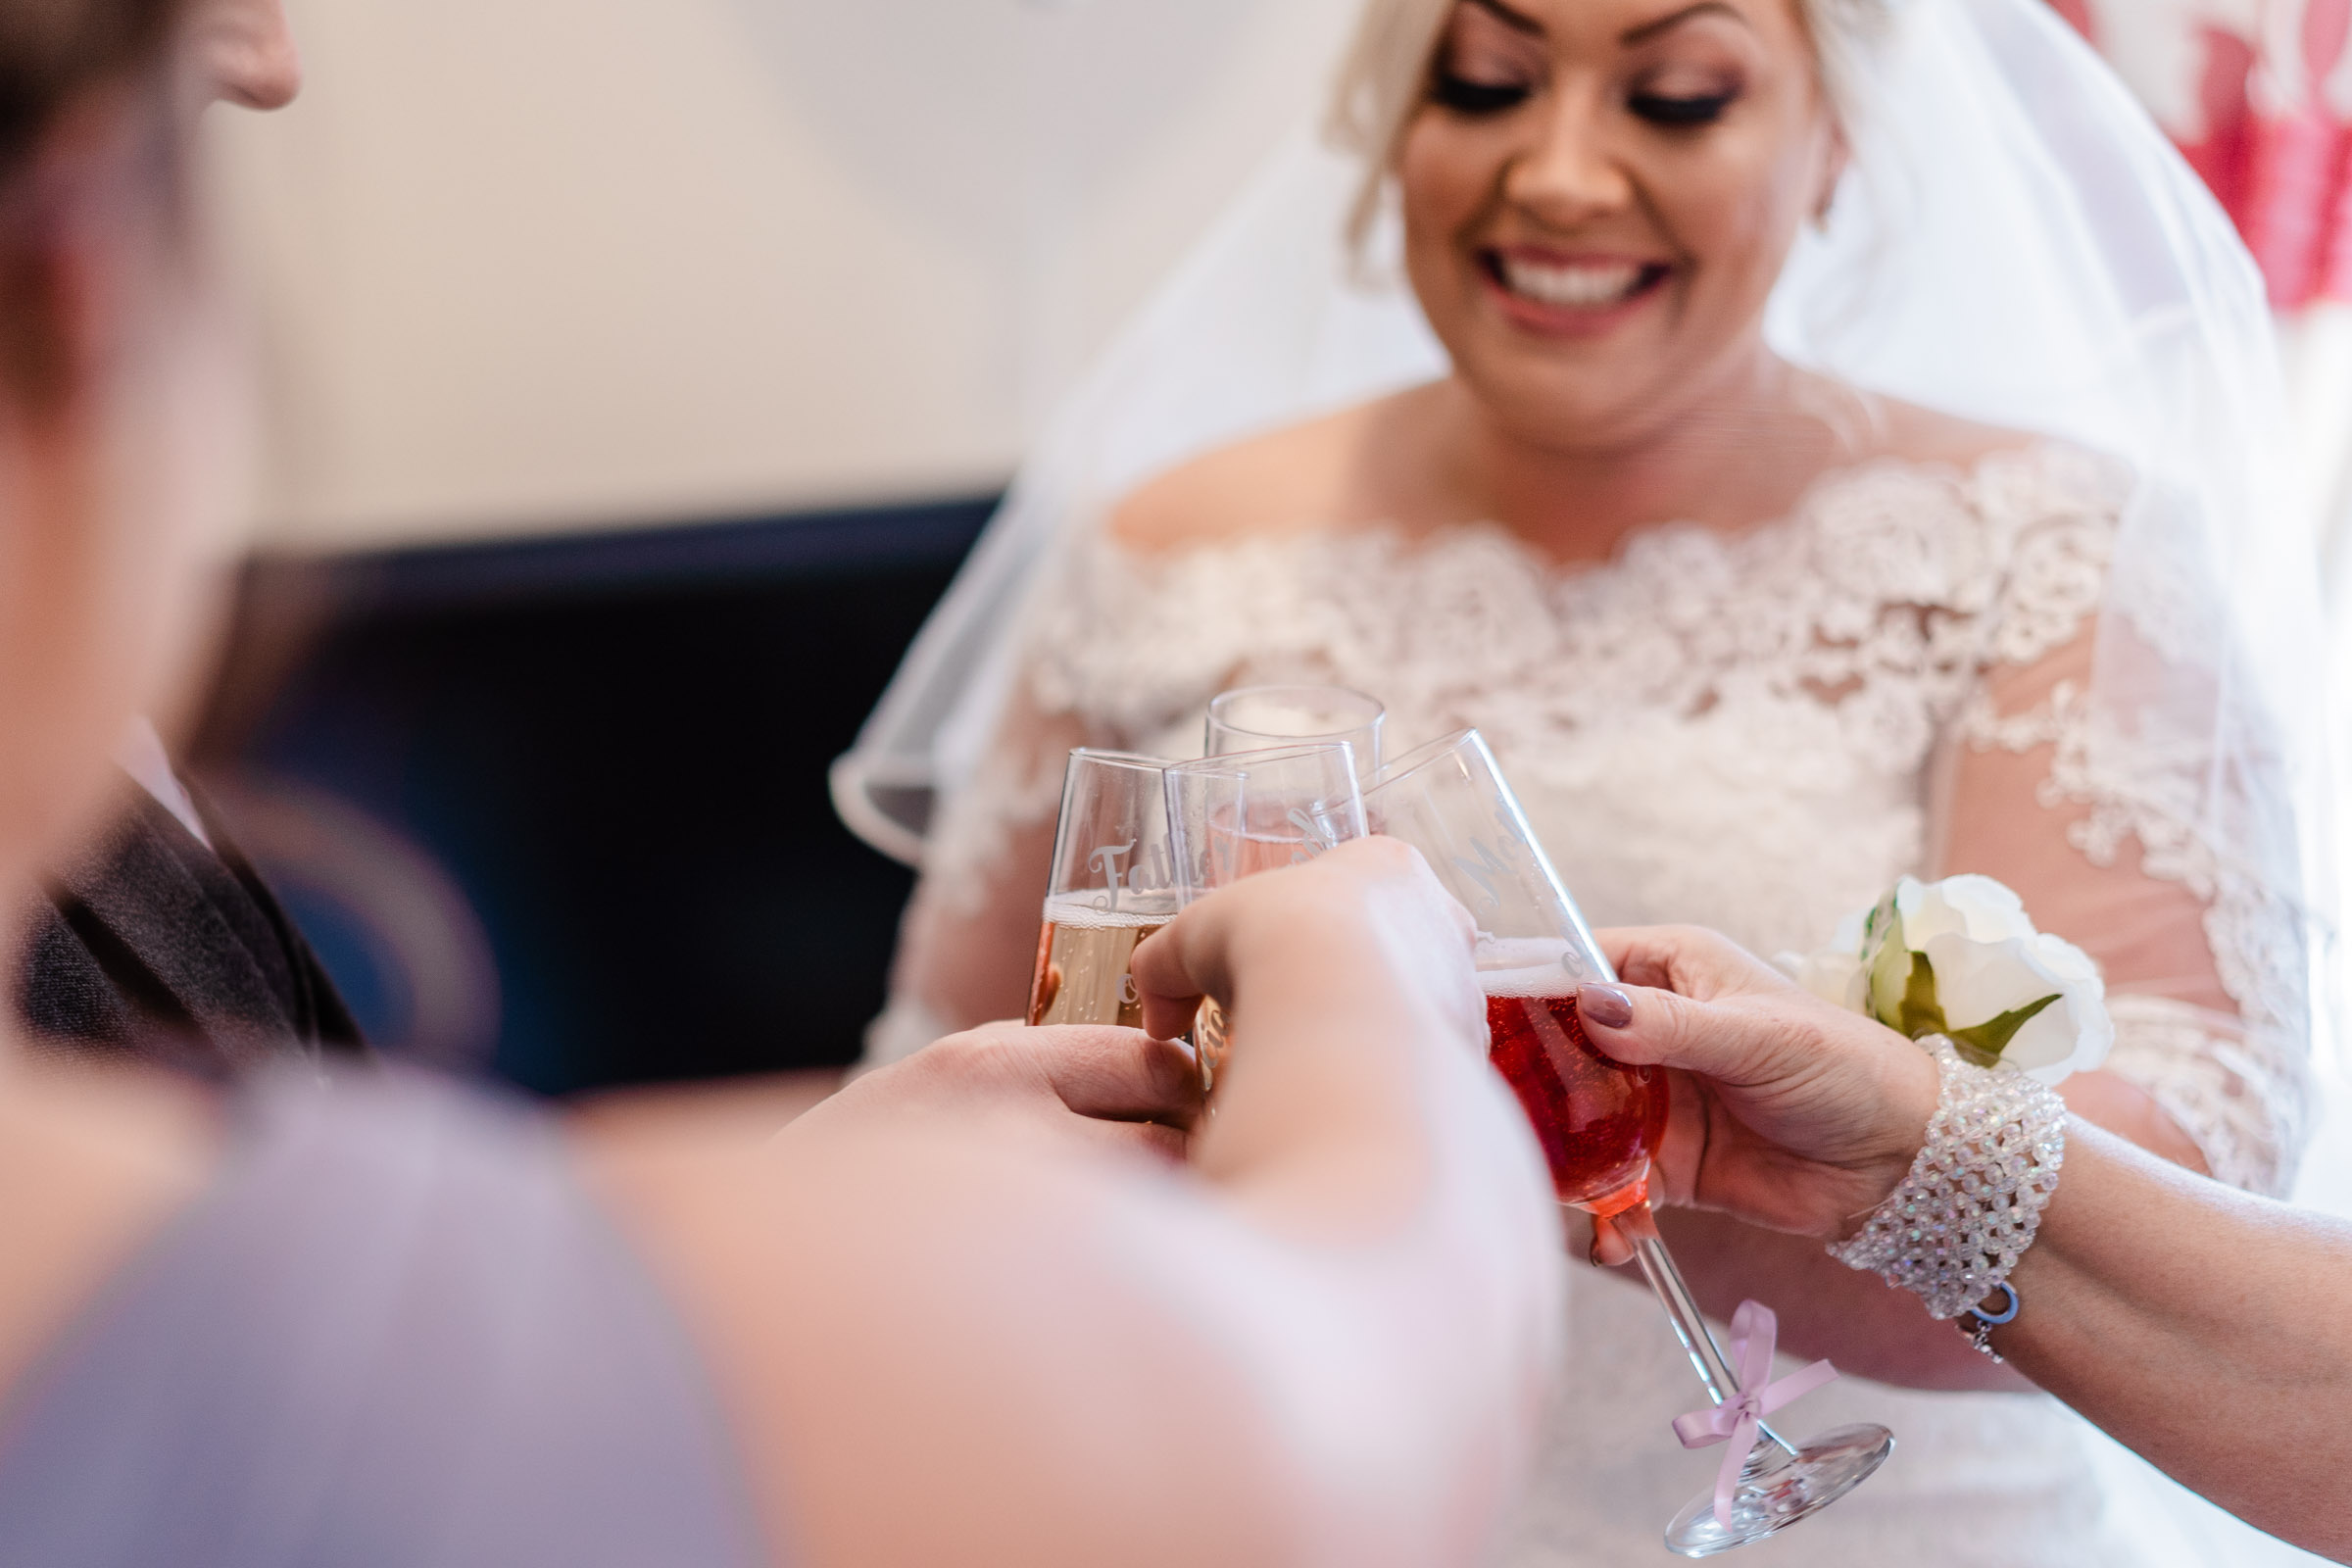 motherwell-moorings-wedding-photographer-dearlyphotography (21 of 77).jpg